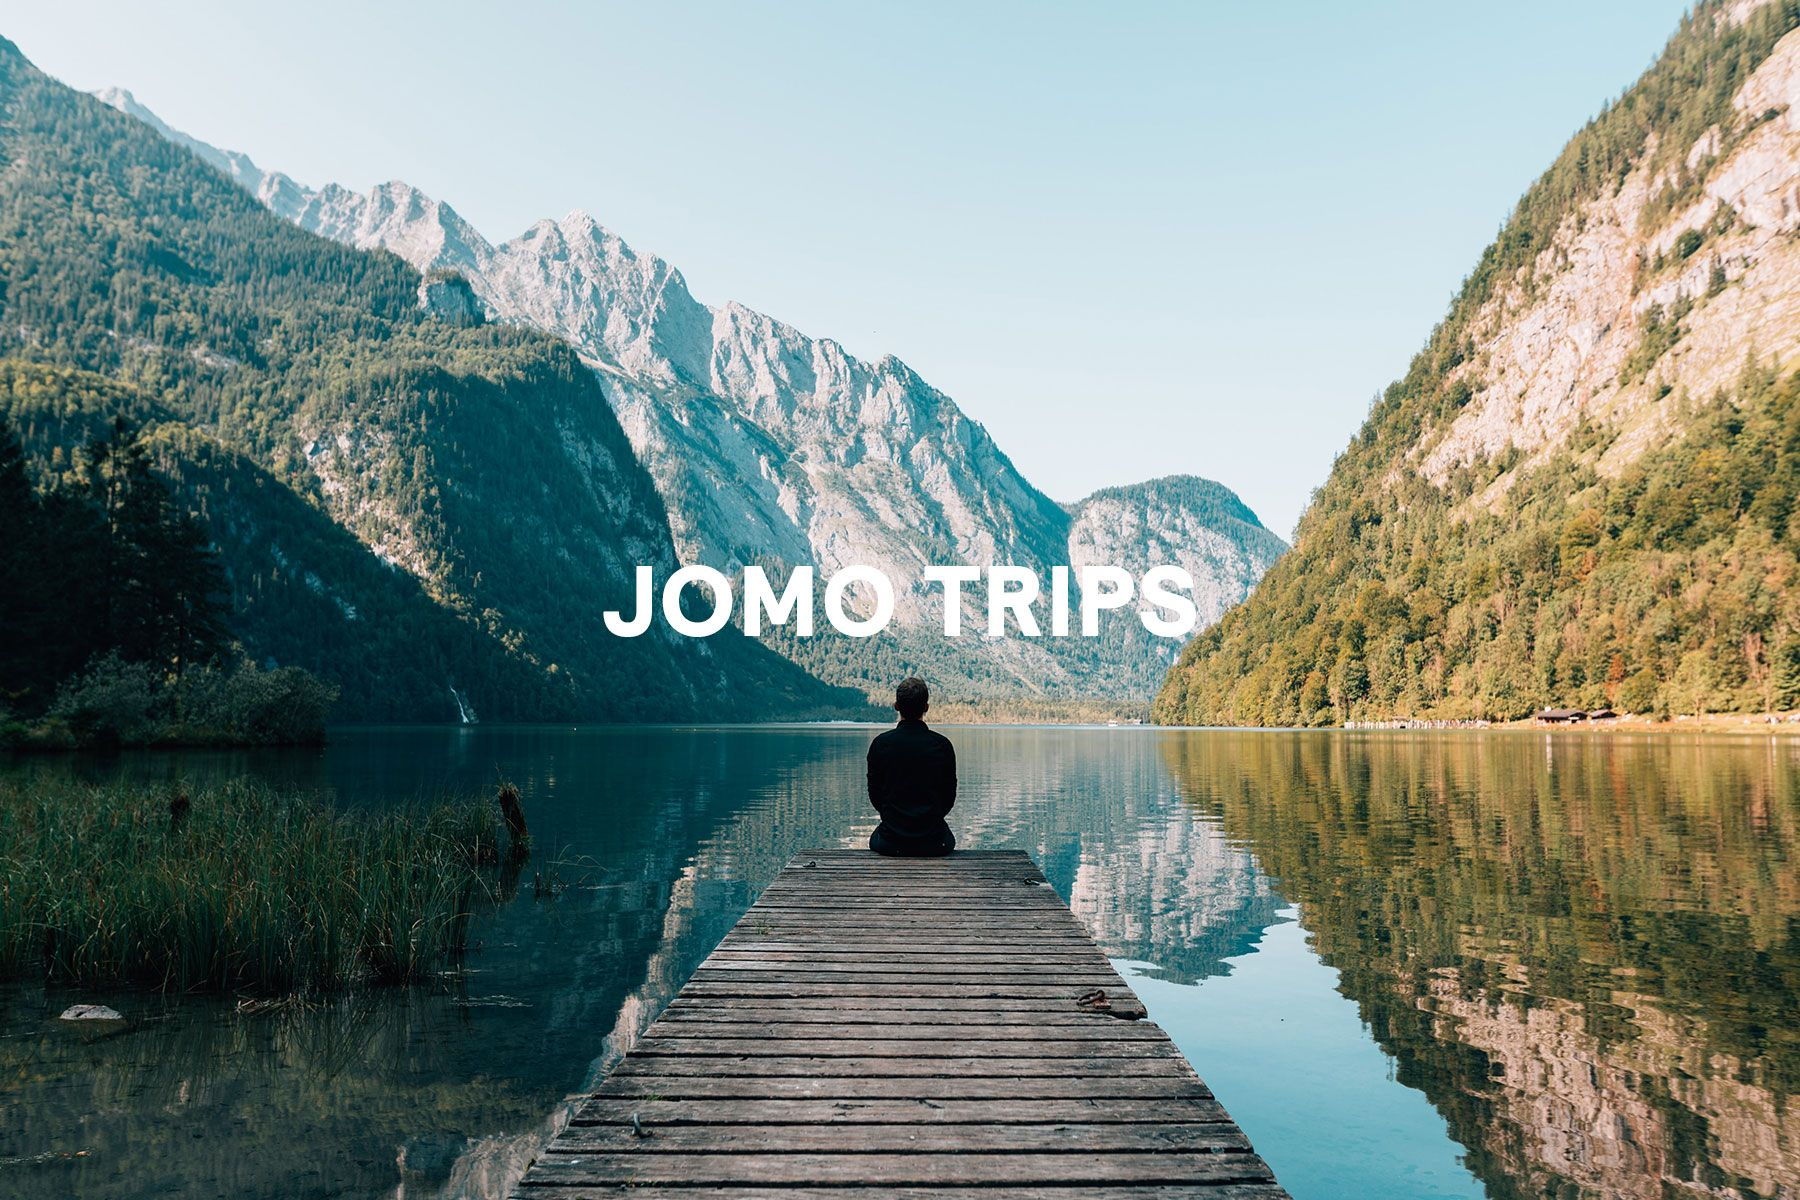 Jomo Trips